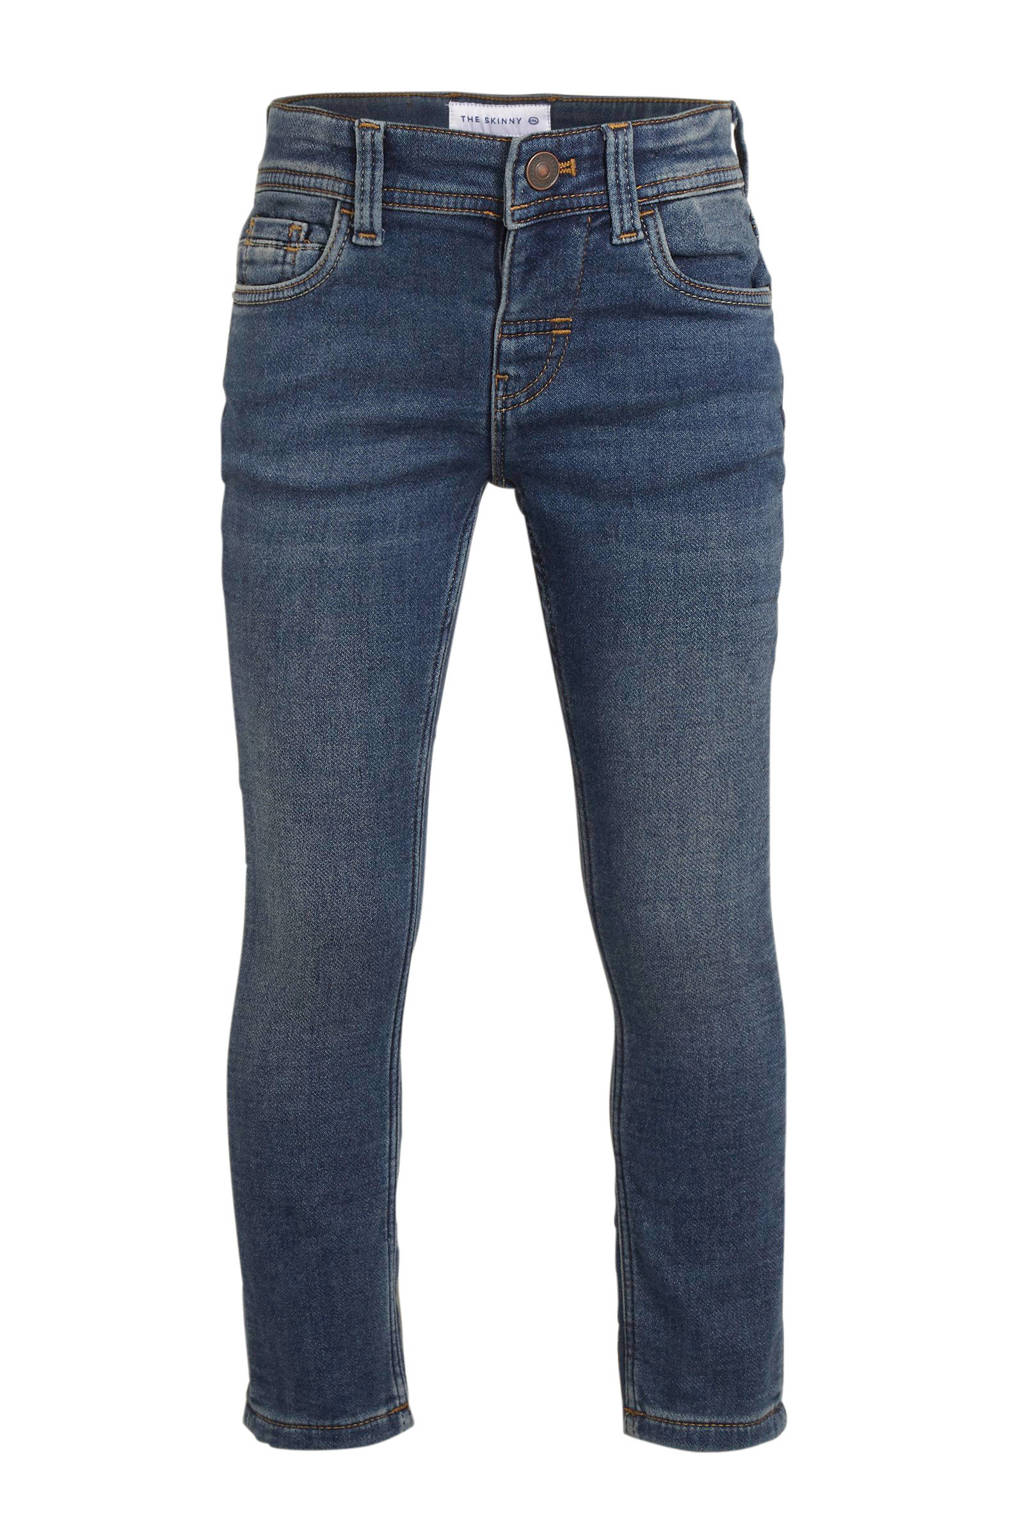 C&A Palomino skinny jeans dark denim stonewashed, Dark denim stonewashed